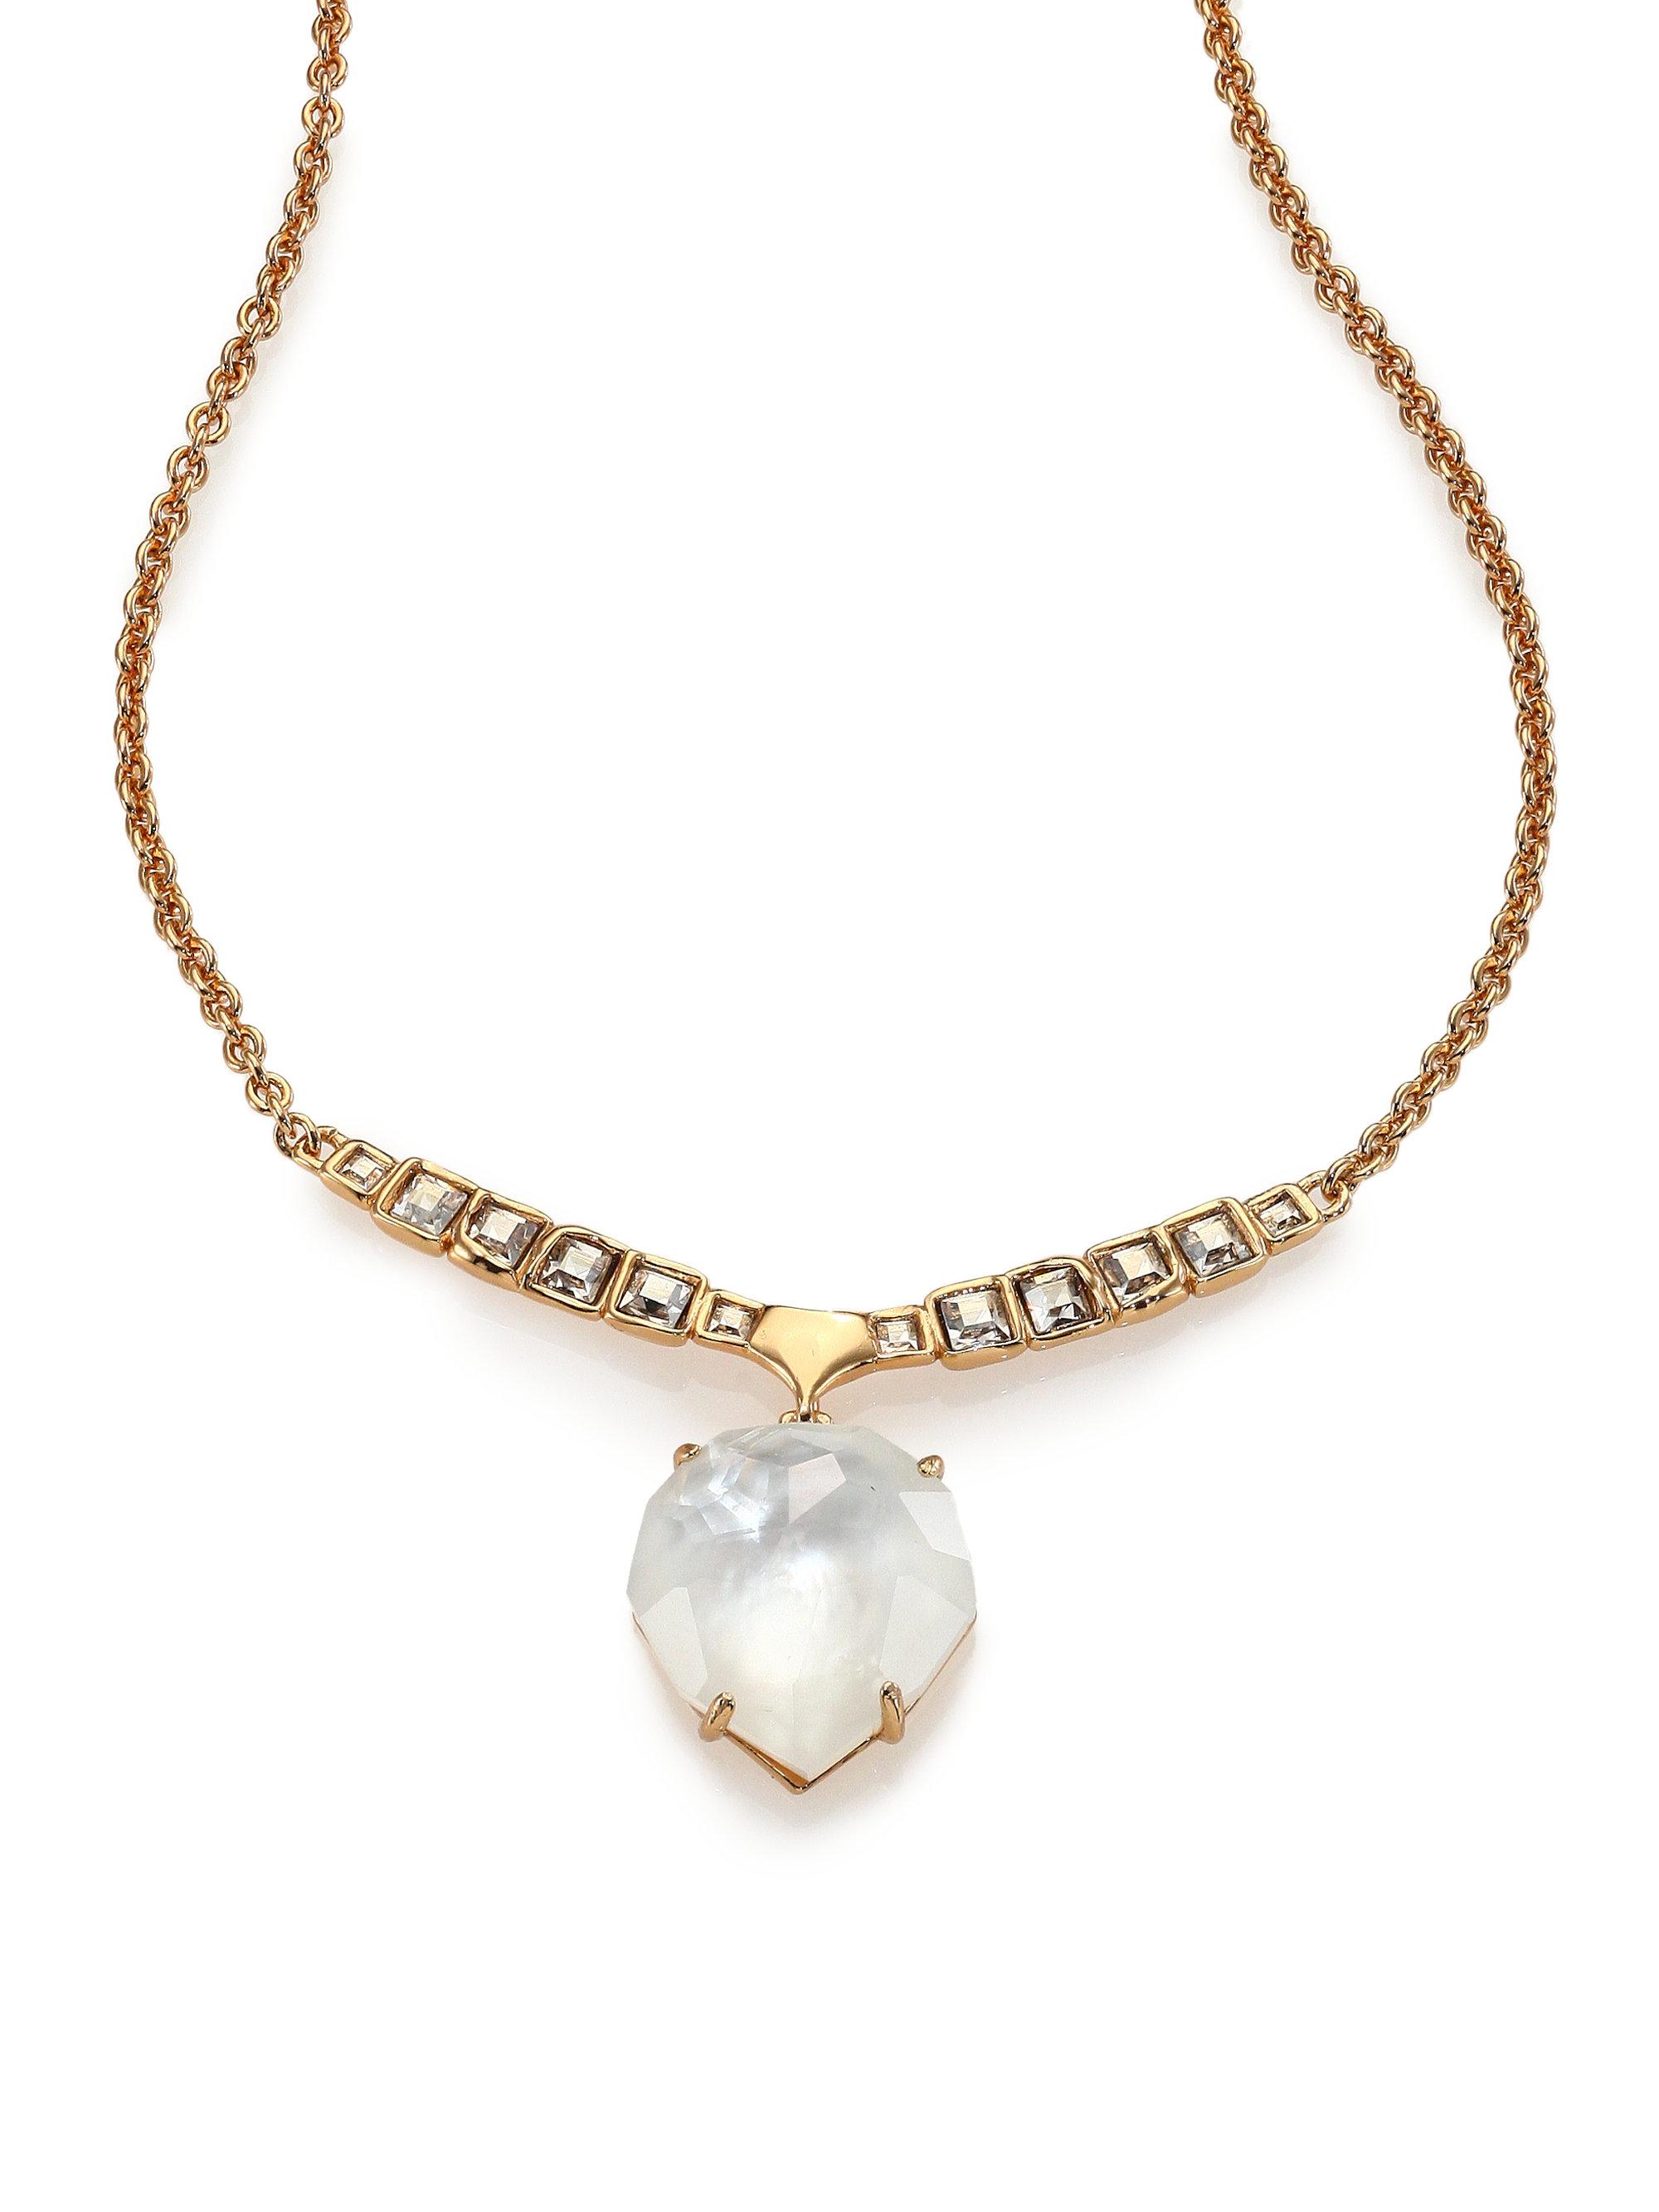 Lyst - Alexis bittar Miss Havisham Mosaic Mother-of-pearl ...